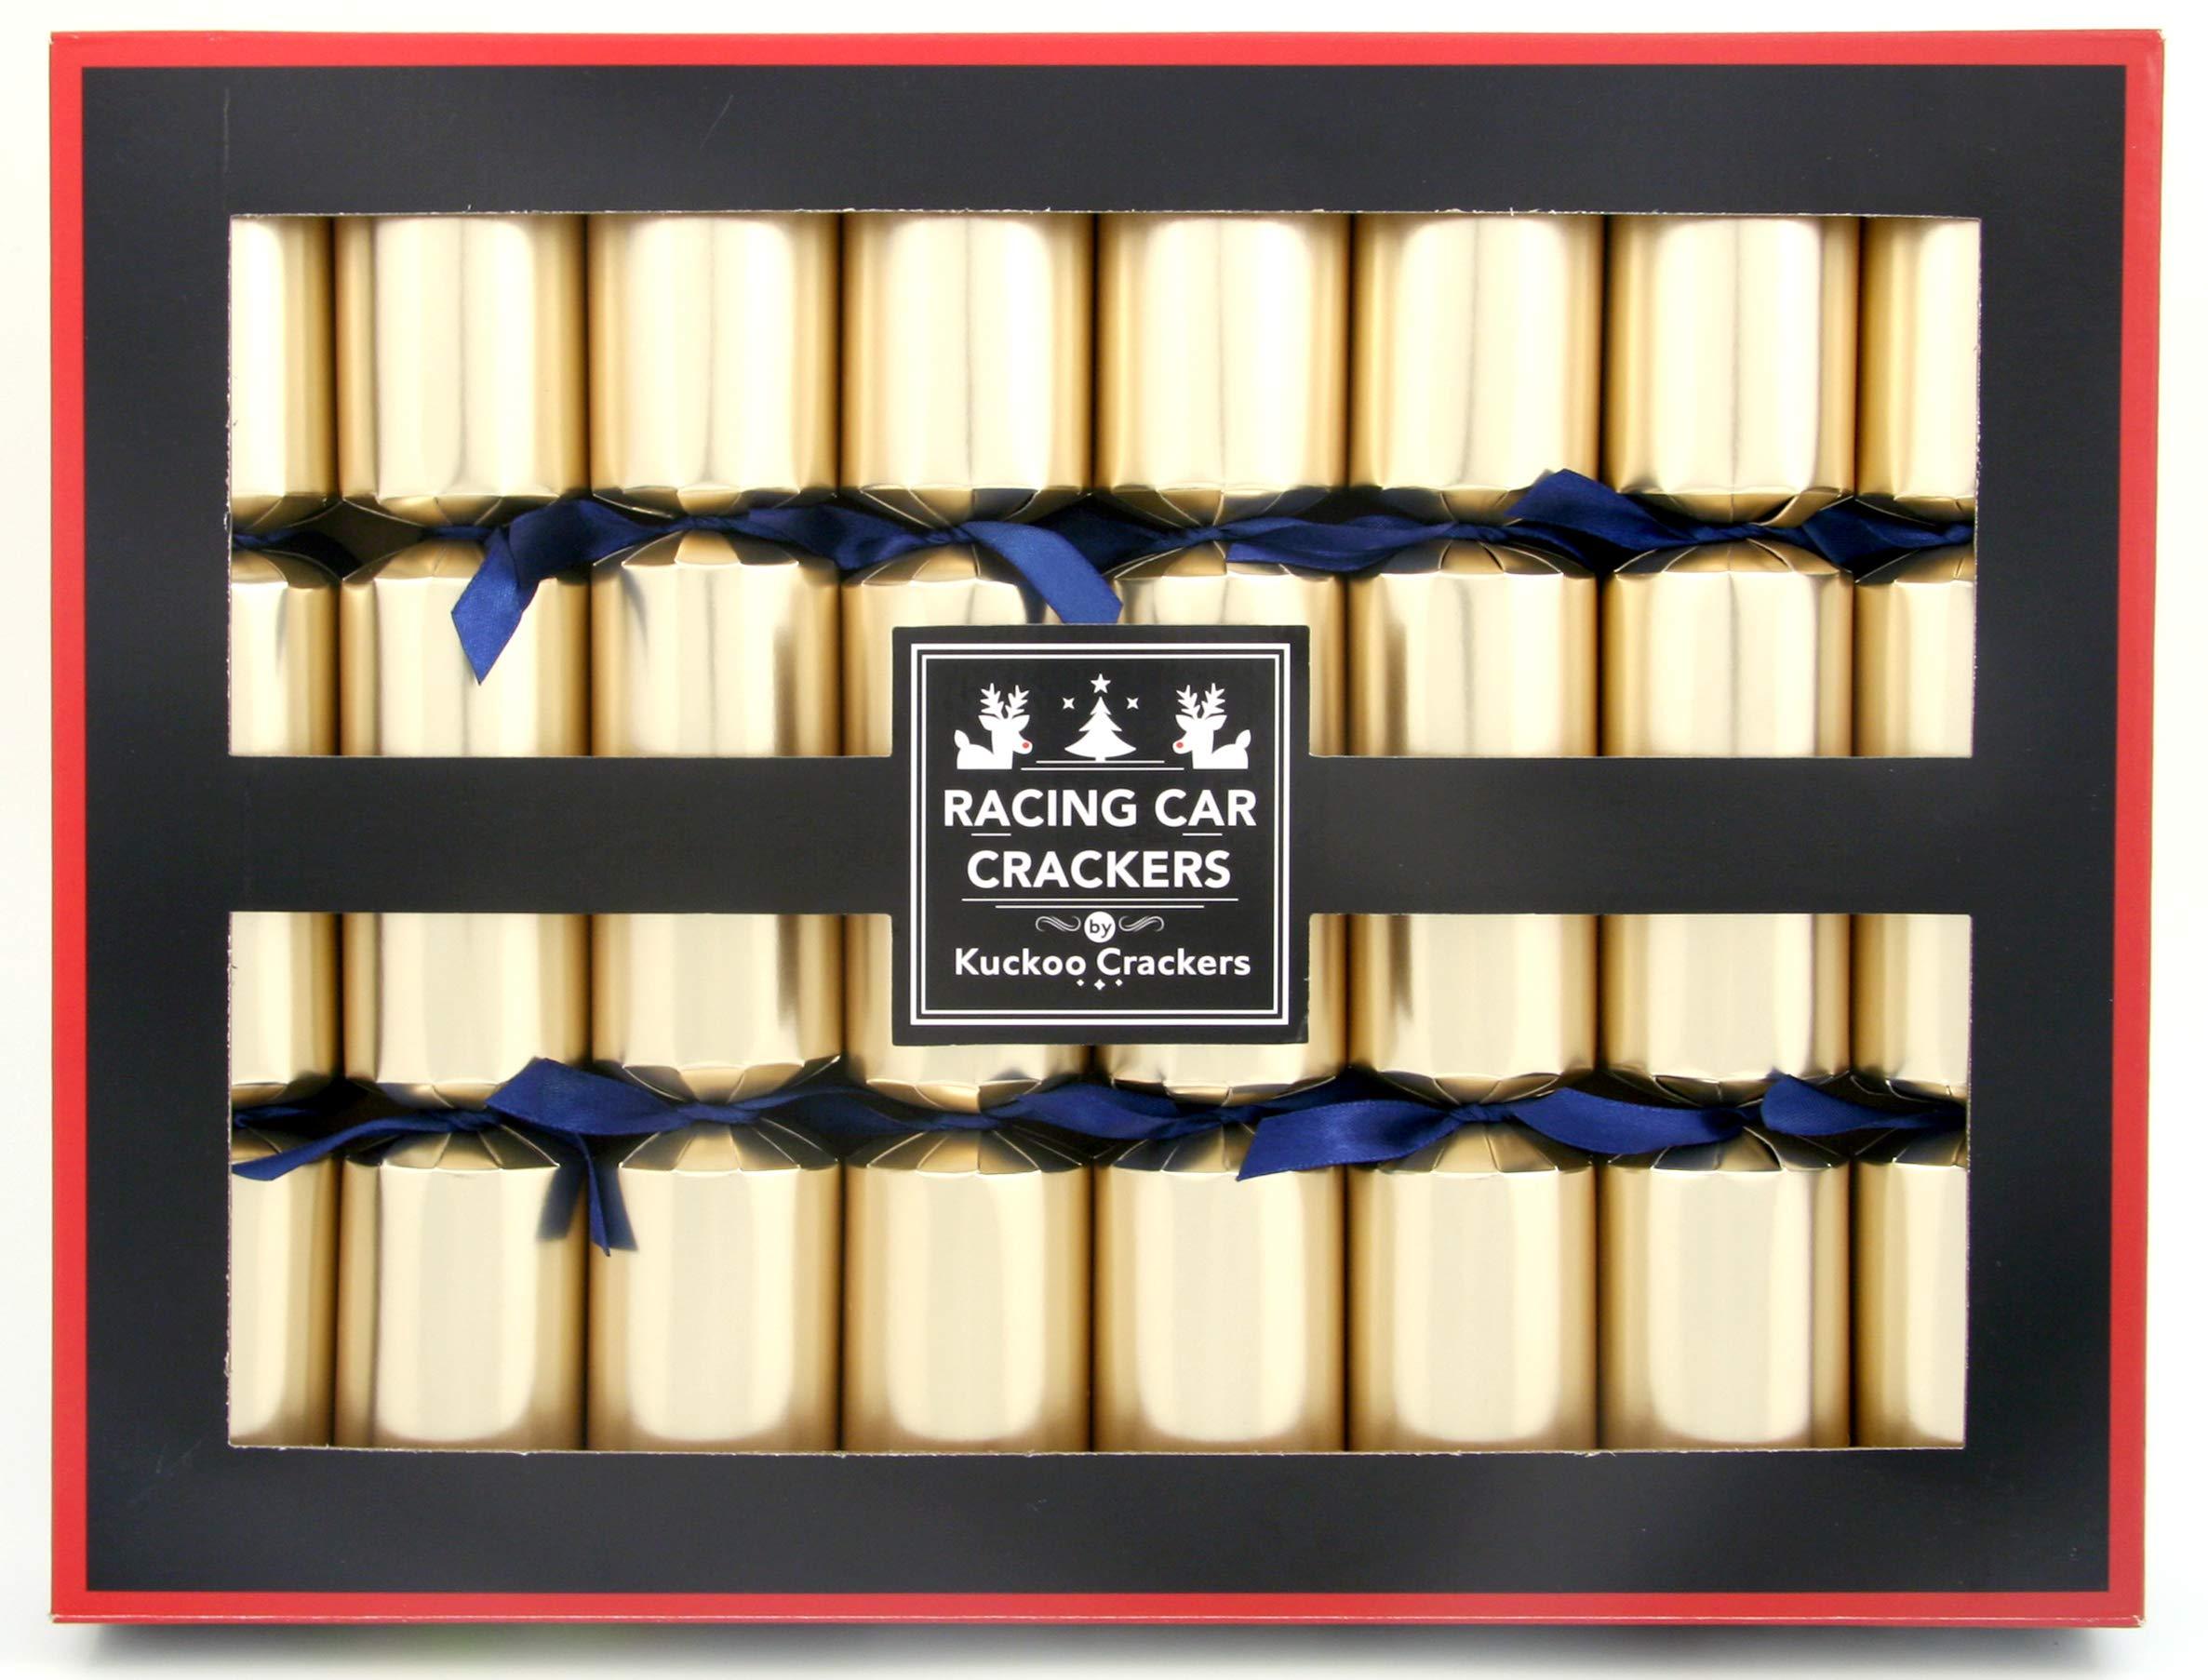 Kuckoo Crackers: 8 x 12-inch Racing Car Christmas Crackers